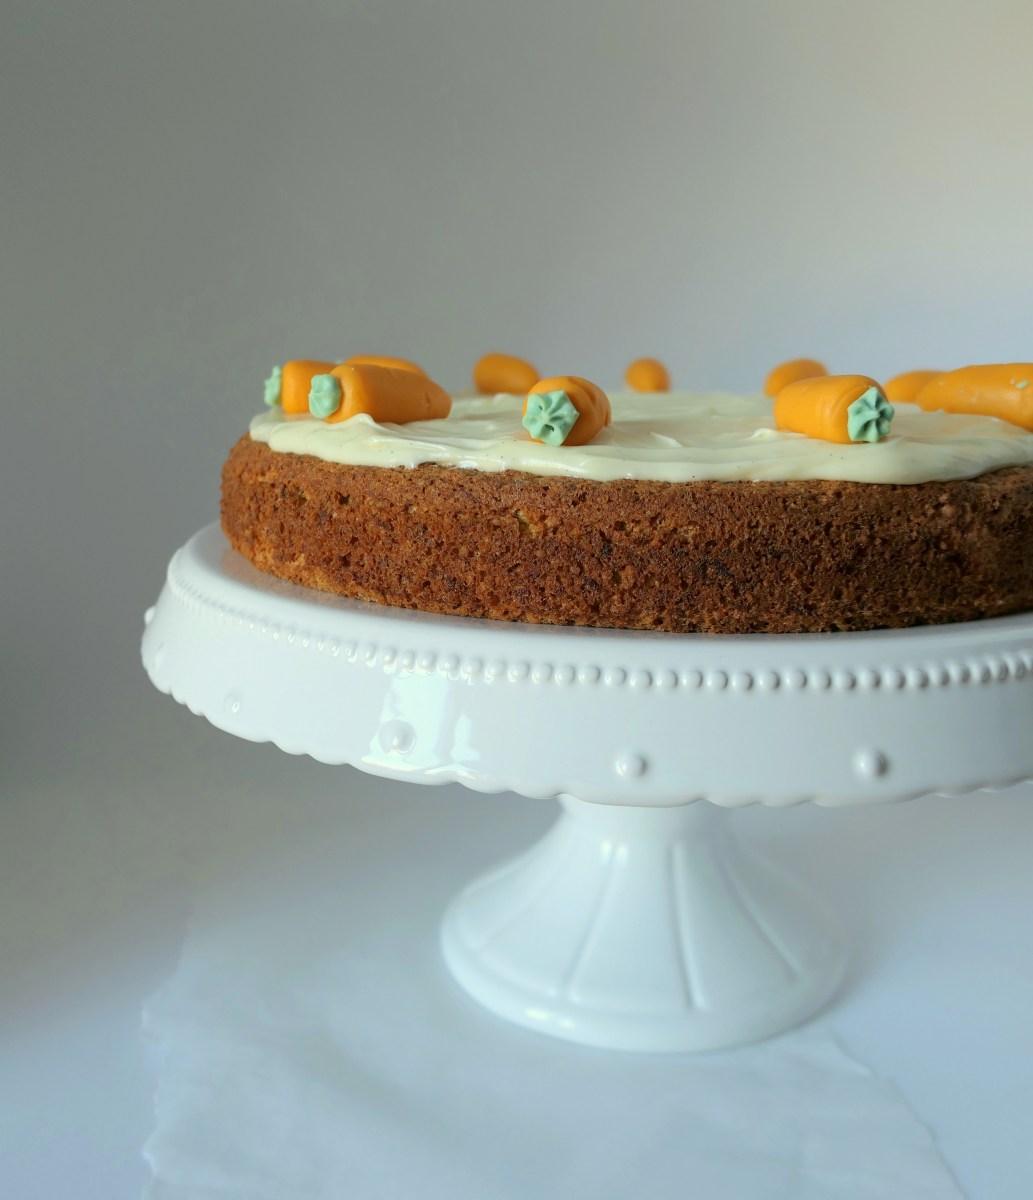 Recipe: Gluten-Free Carrot Cake (Aargauer Rüeblitorte)